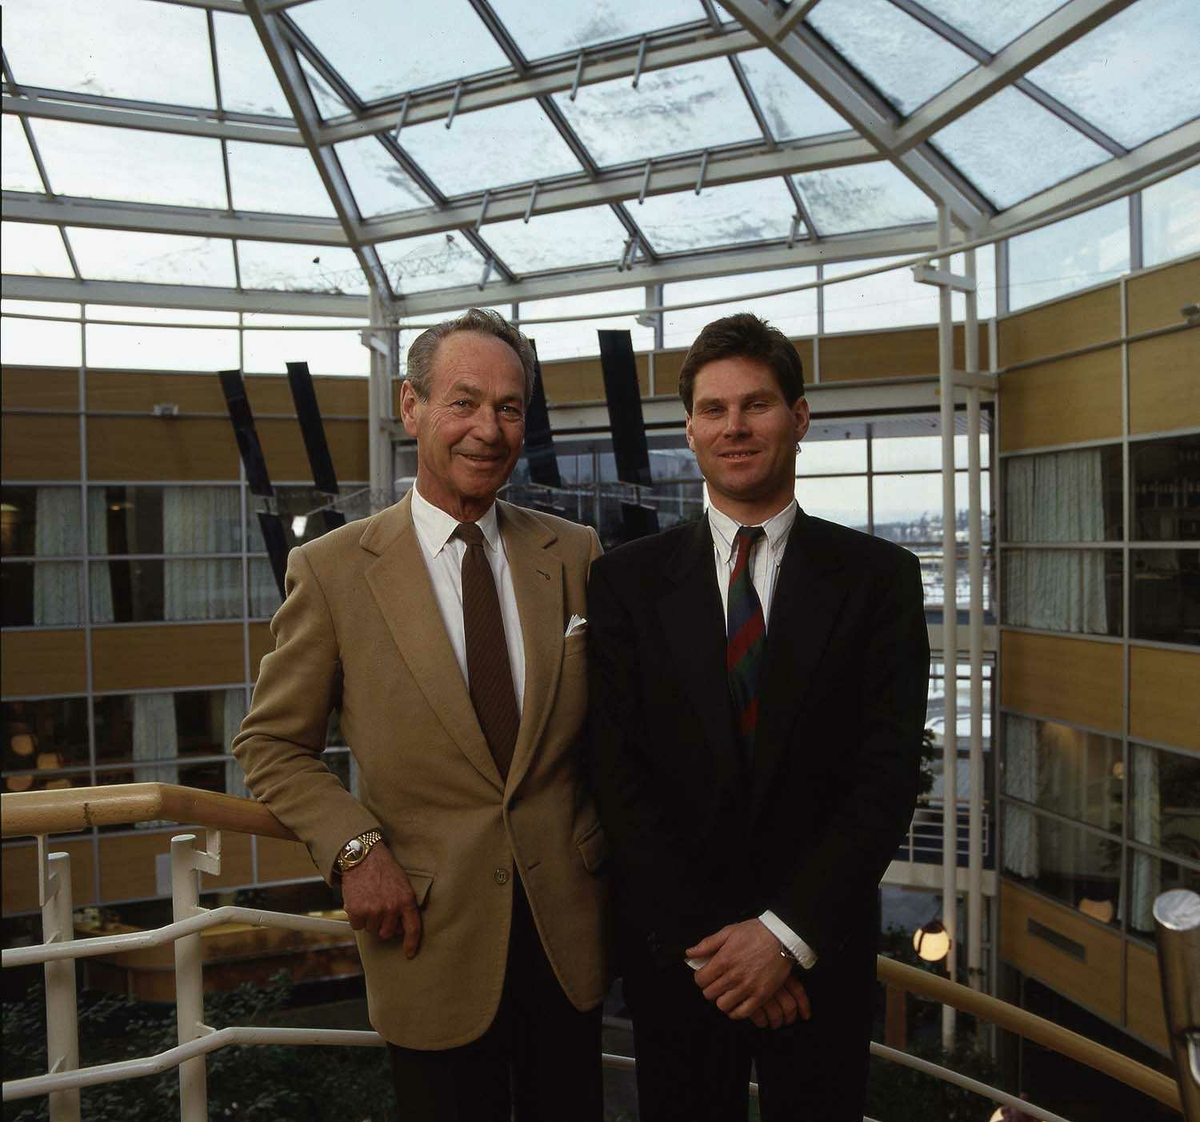 To personer på bildet. Bjørn G. og Erik G. Braathen. Stående i trapp